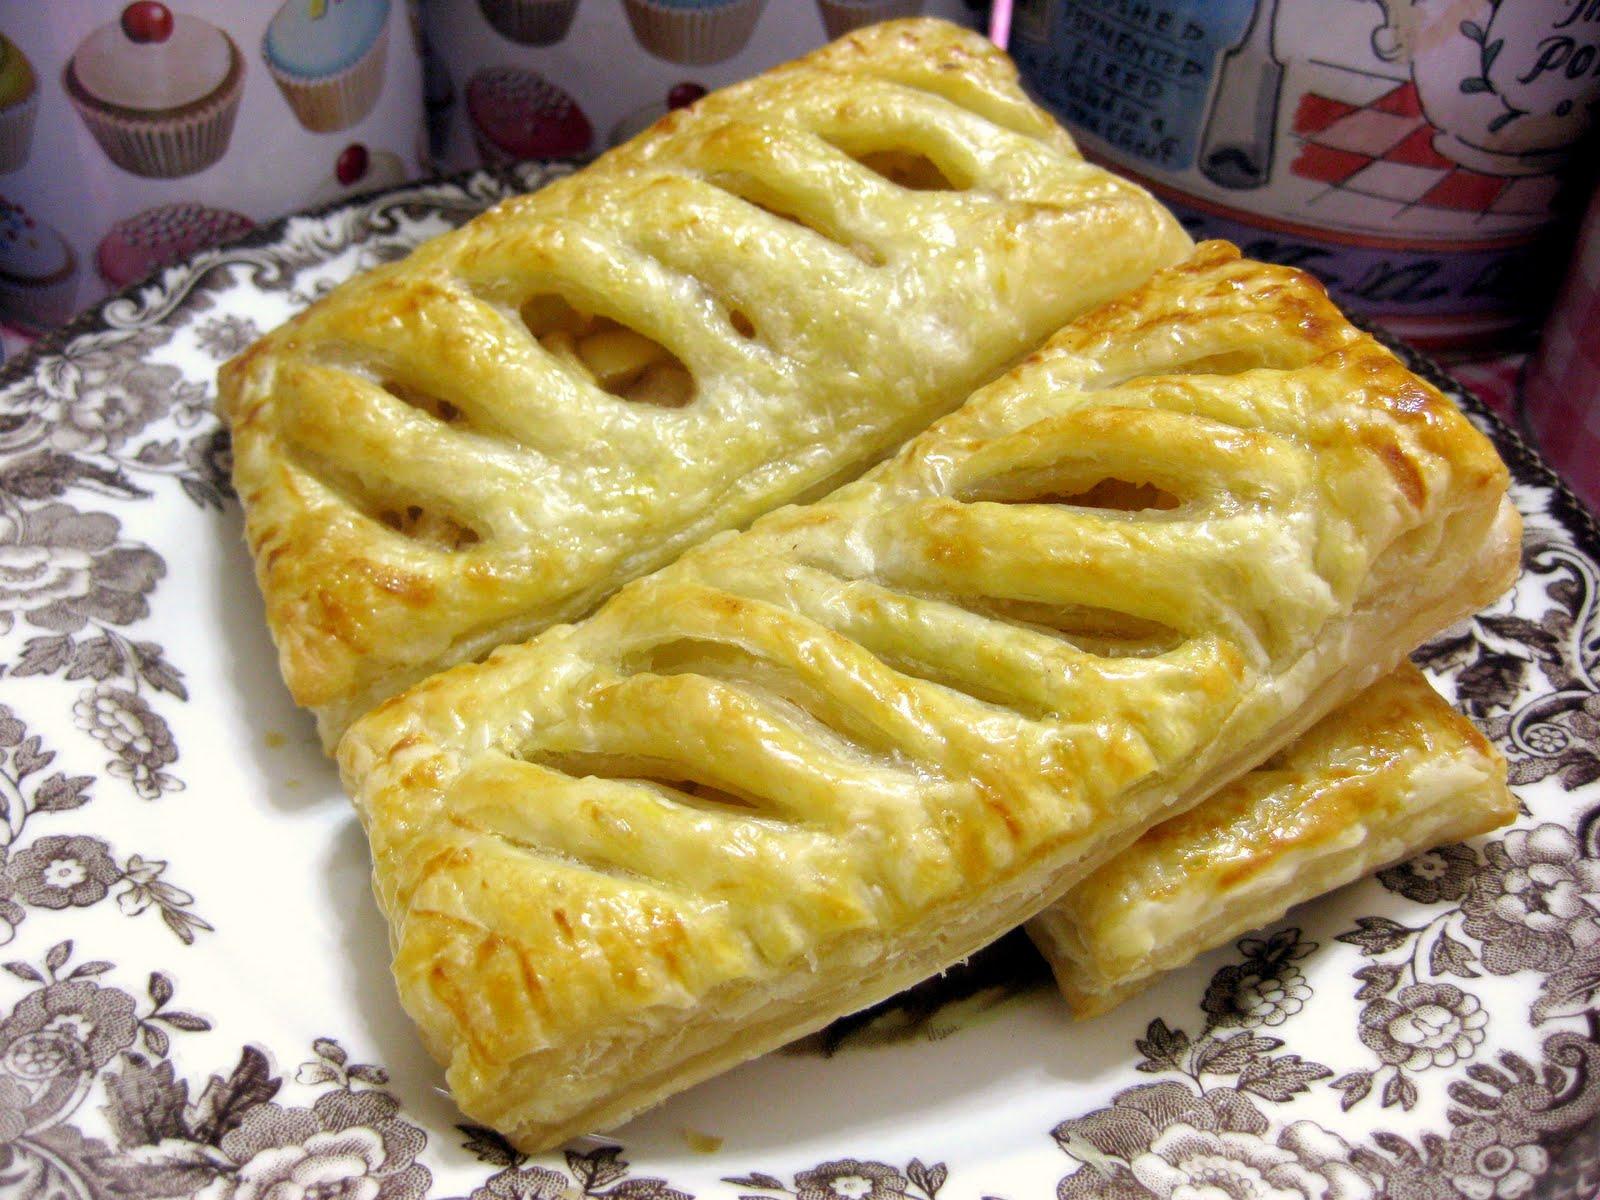 ... basic crepes basic gnocchi basic crepes basic crepes basic pie rogi